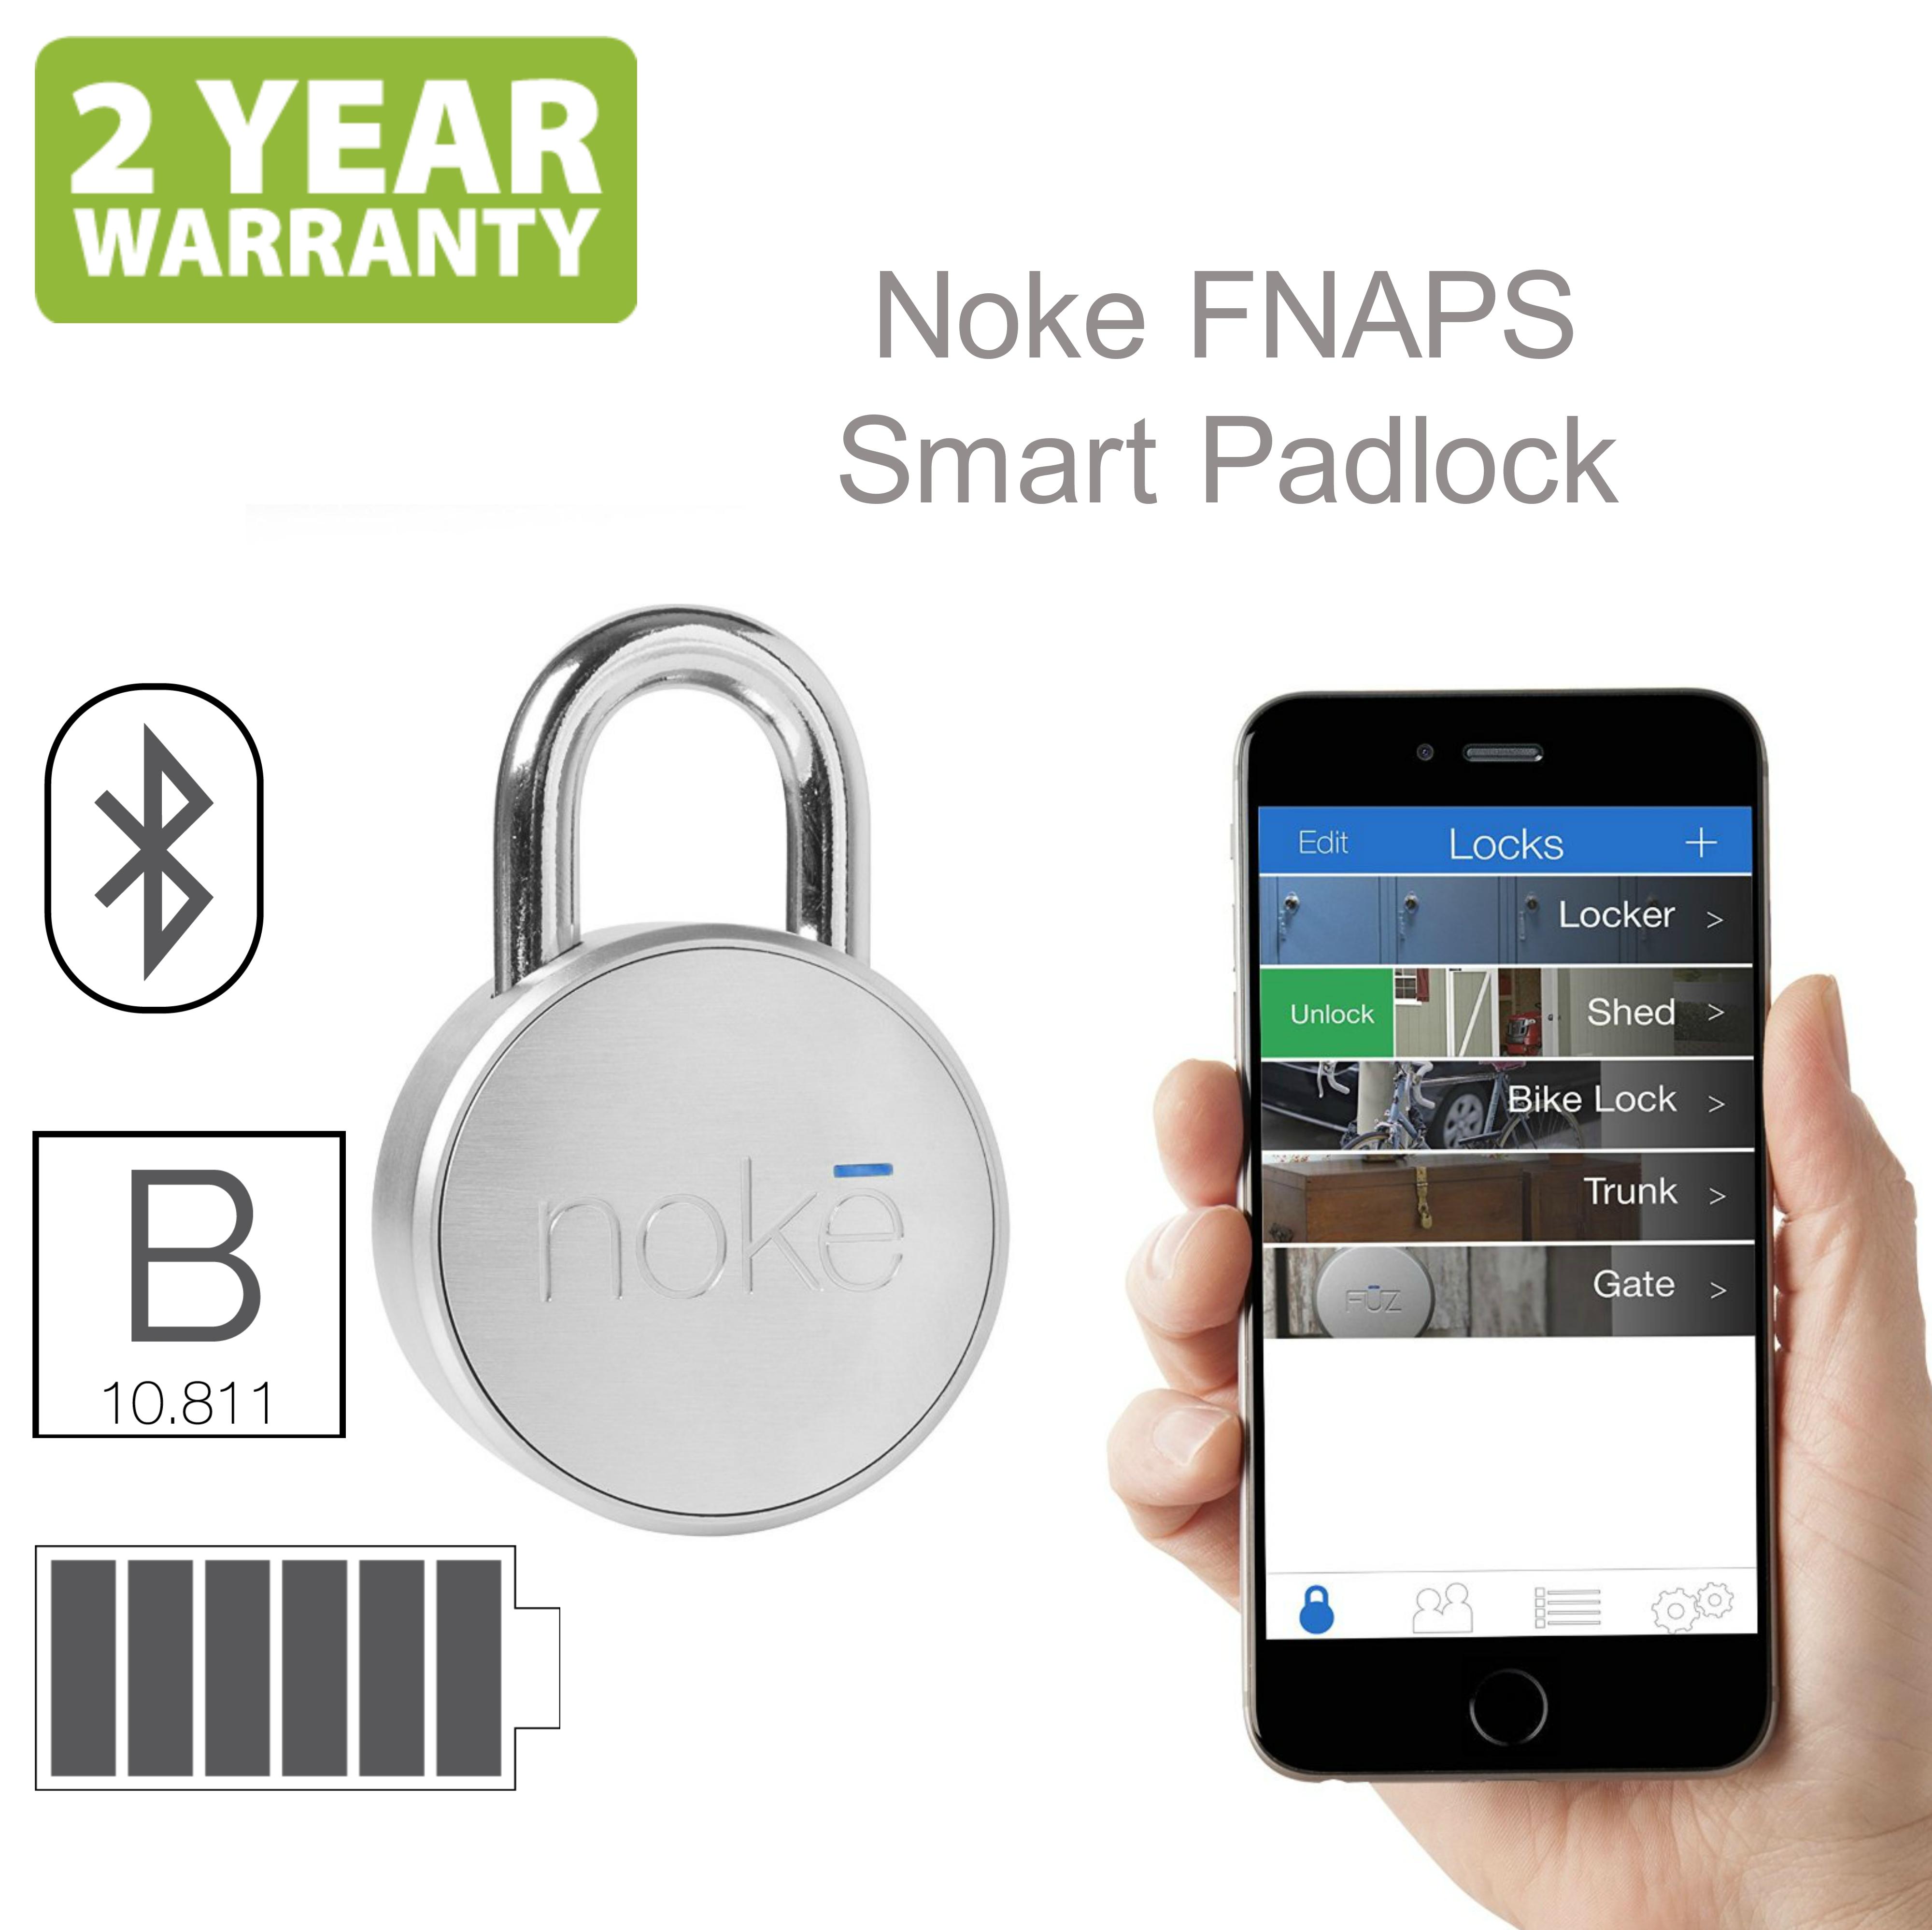 Noke FNAPS Smart Padlock|Bluetooth|Waterproof|Bike Backgate Smartphone Security